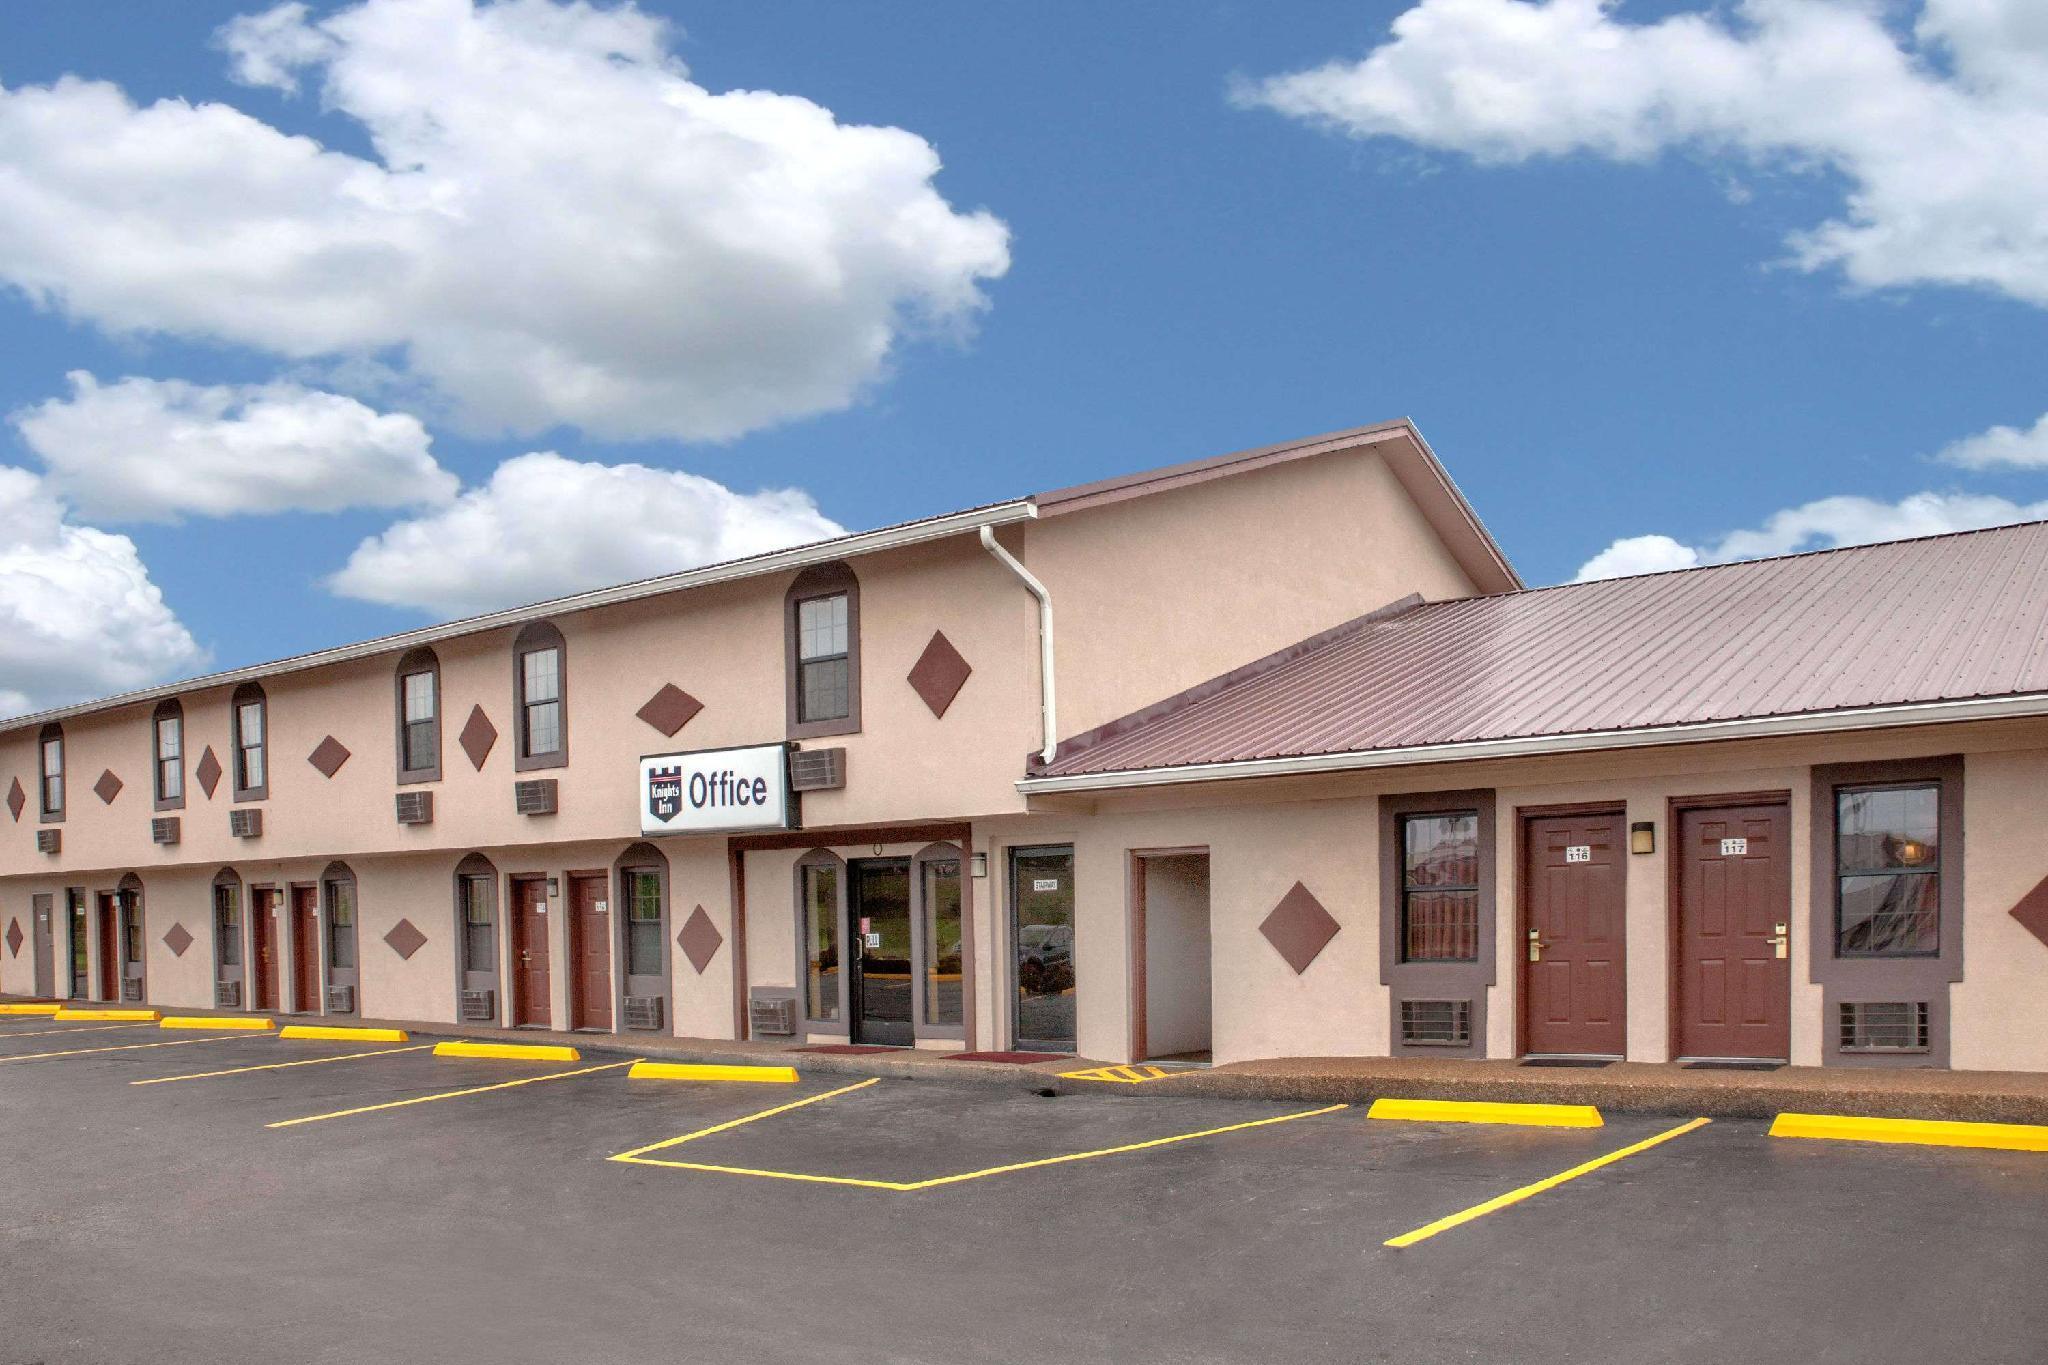 Knights Inn - Wildersville, TN, Henderson